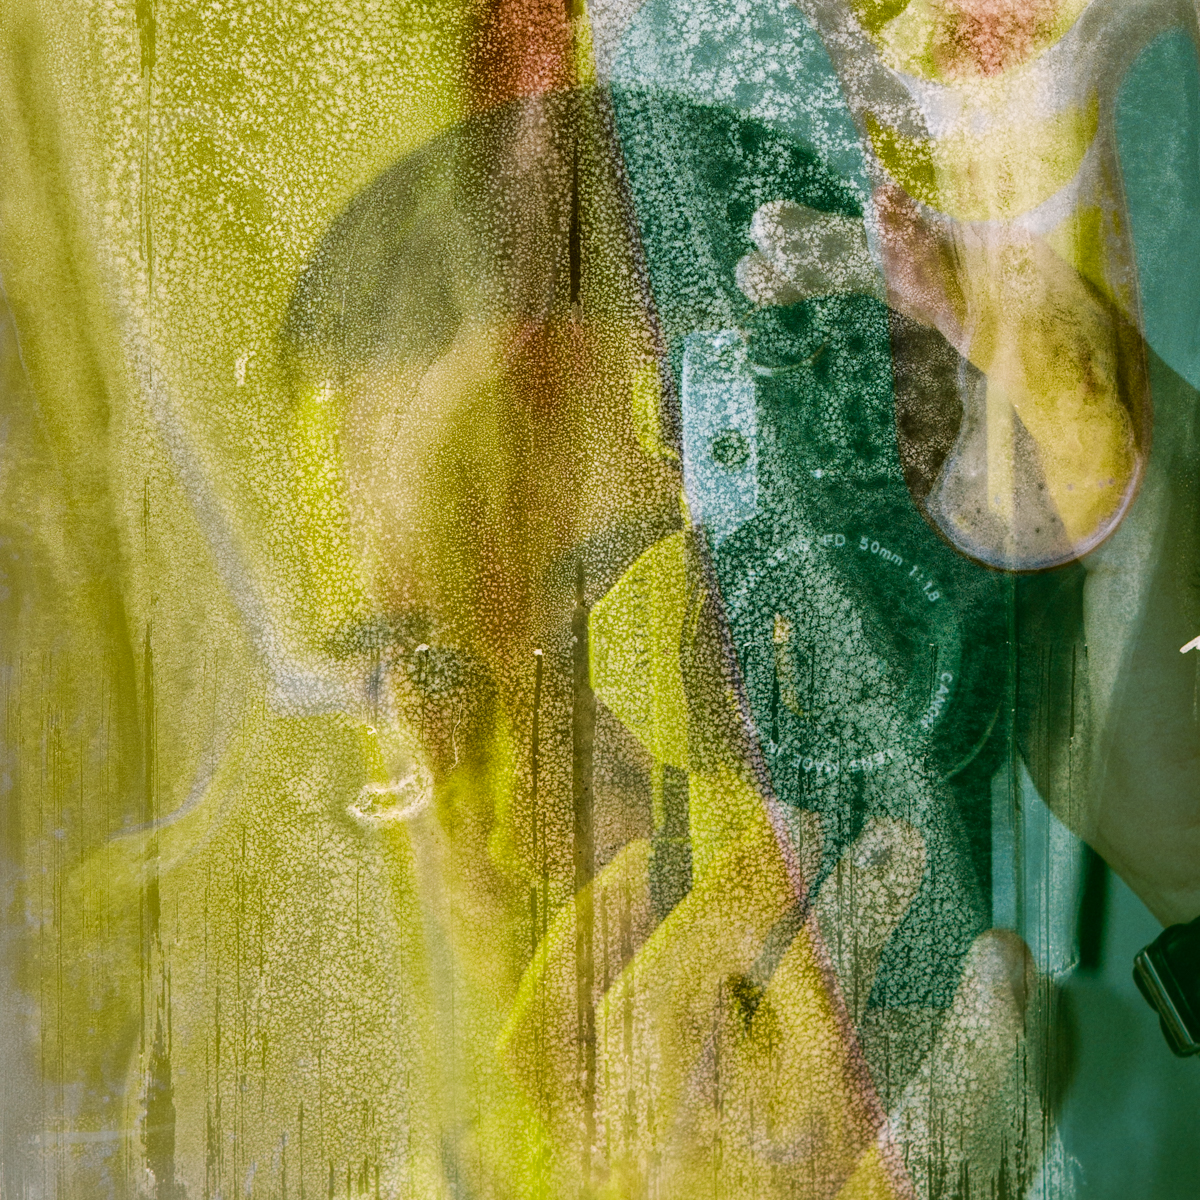 London-photographer-JC-Candanedo-Grey-Pistachio-Fashion-Corporate-Portraits-Headshots-Blog-Creative-Industry-London-film-soup-household-chemicals-negative-destroy.jpg